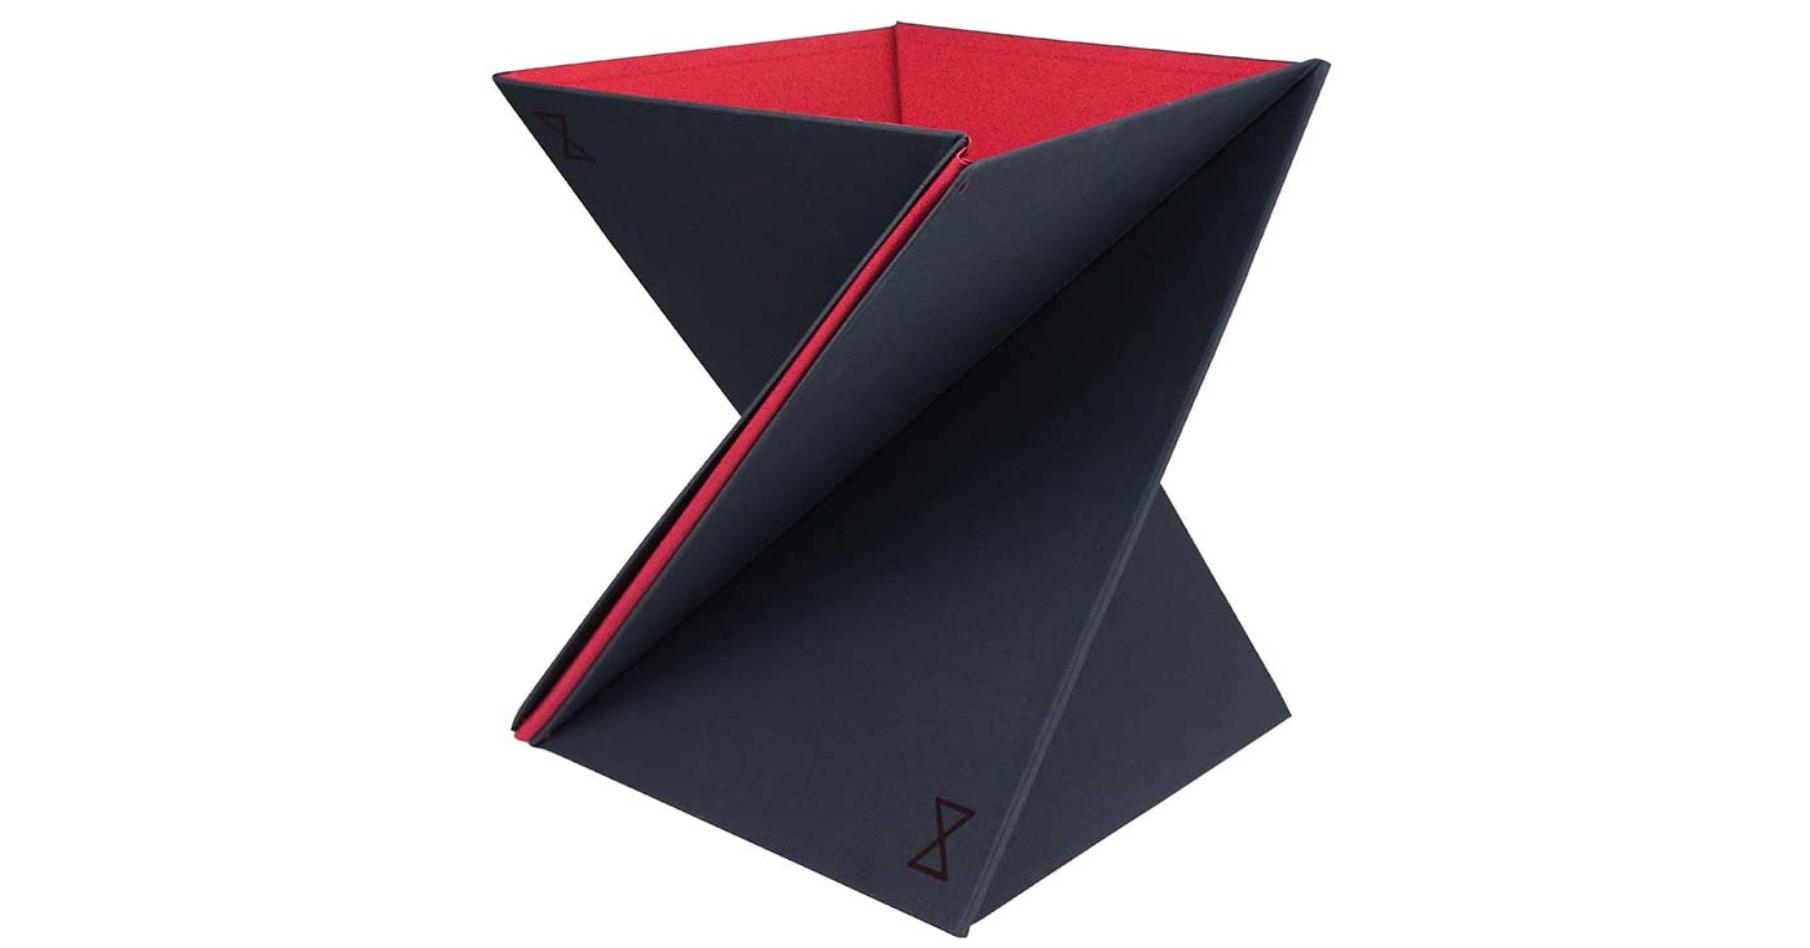 Folding Portable Standing Desk